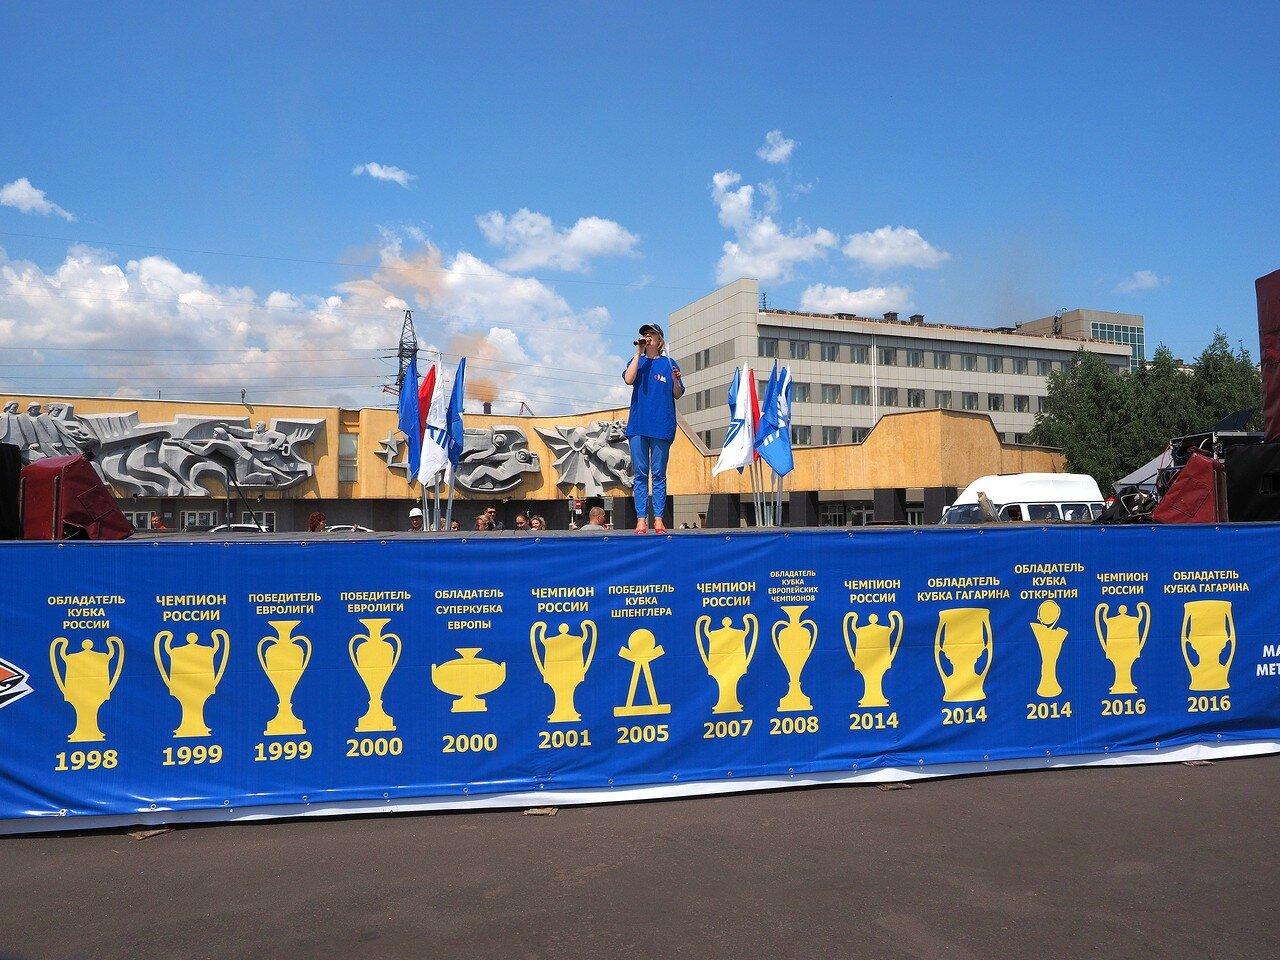 146Церемония чествования команды Металлург27.05.2016